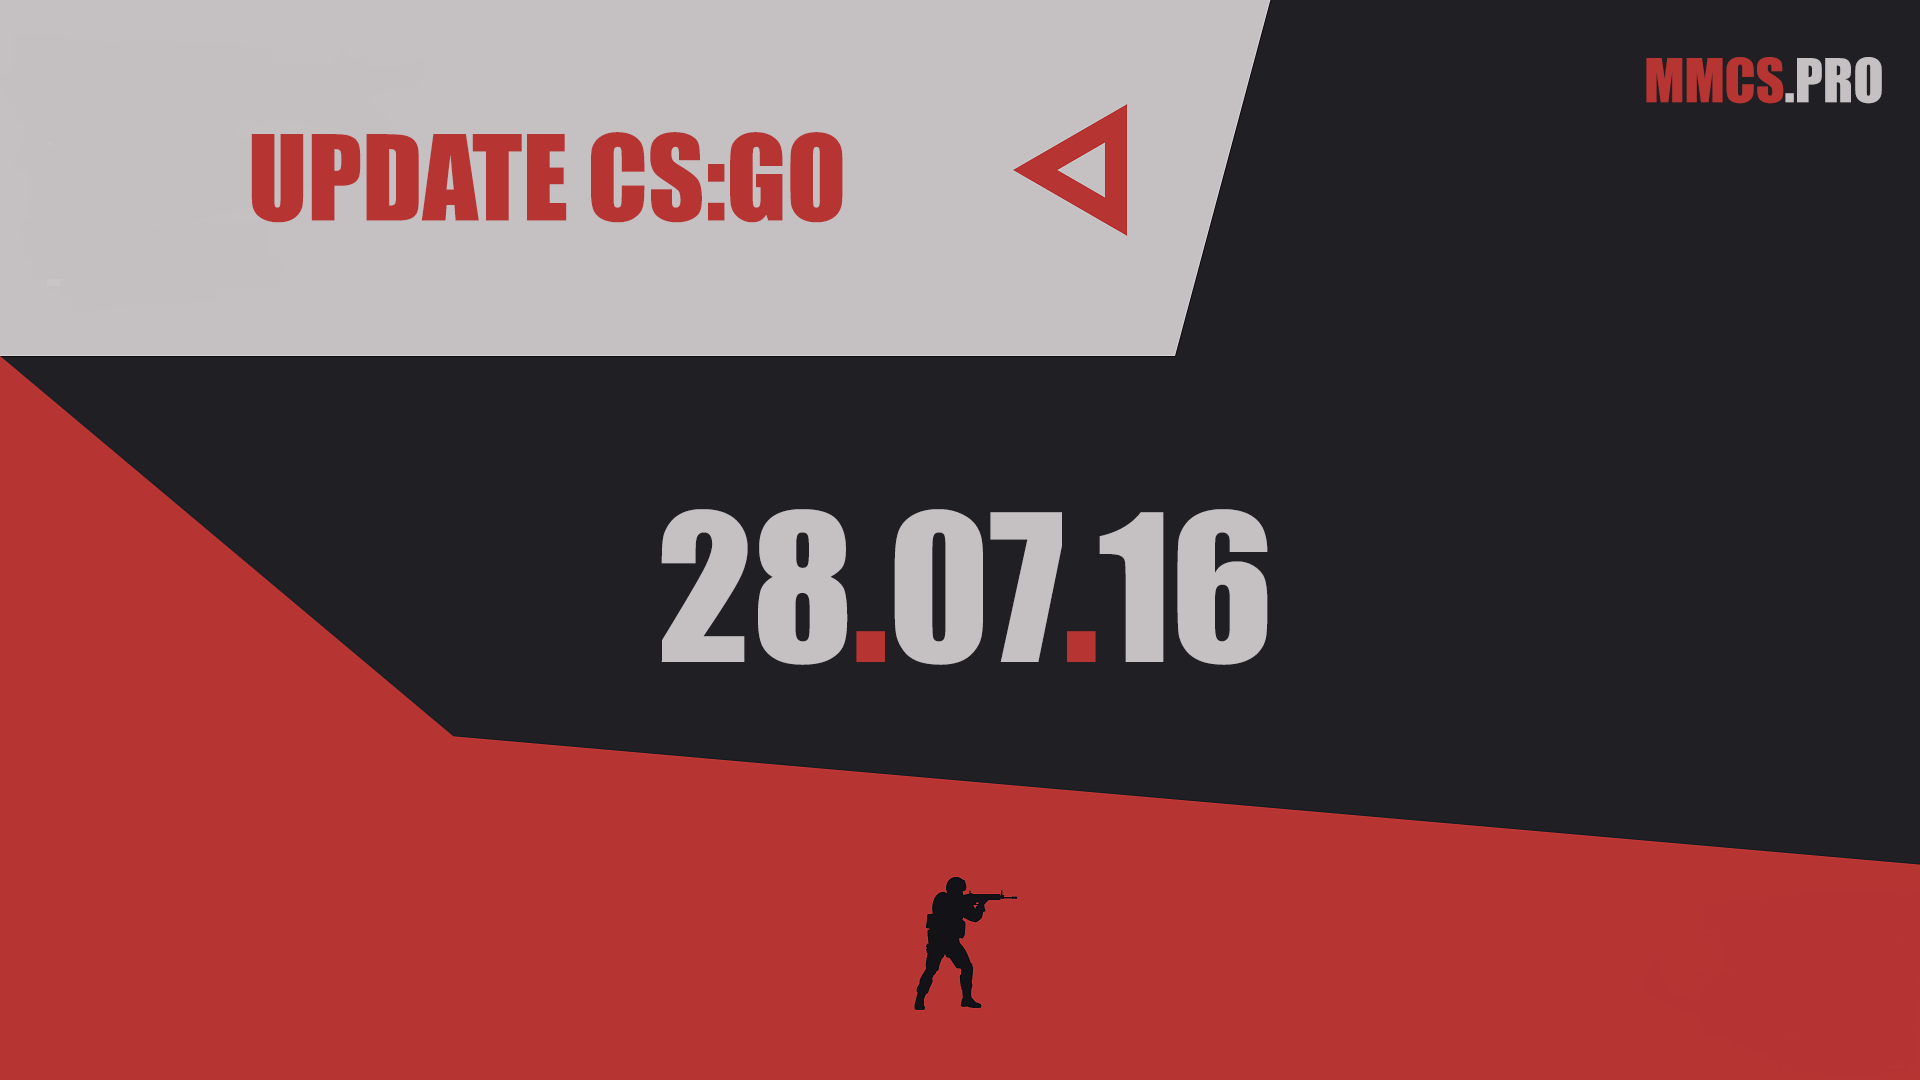 https://mmcs.pro/update-csgo-28-07-2016-valve/